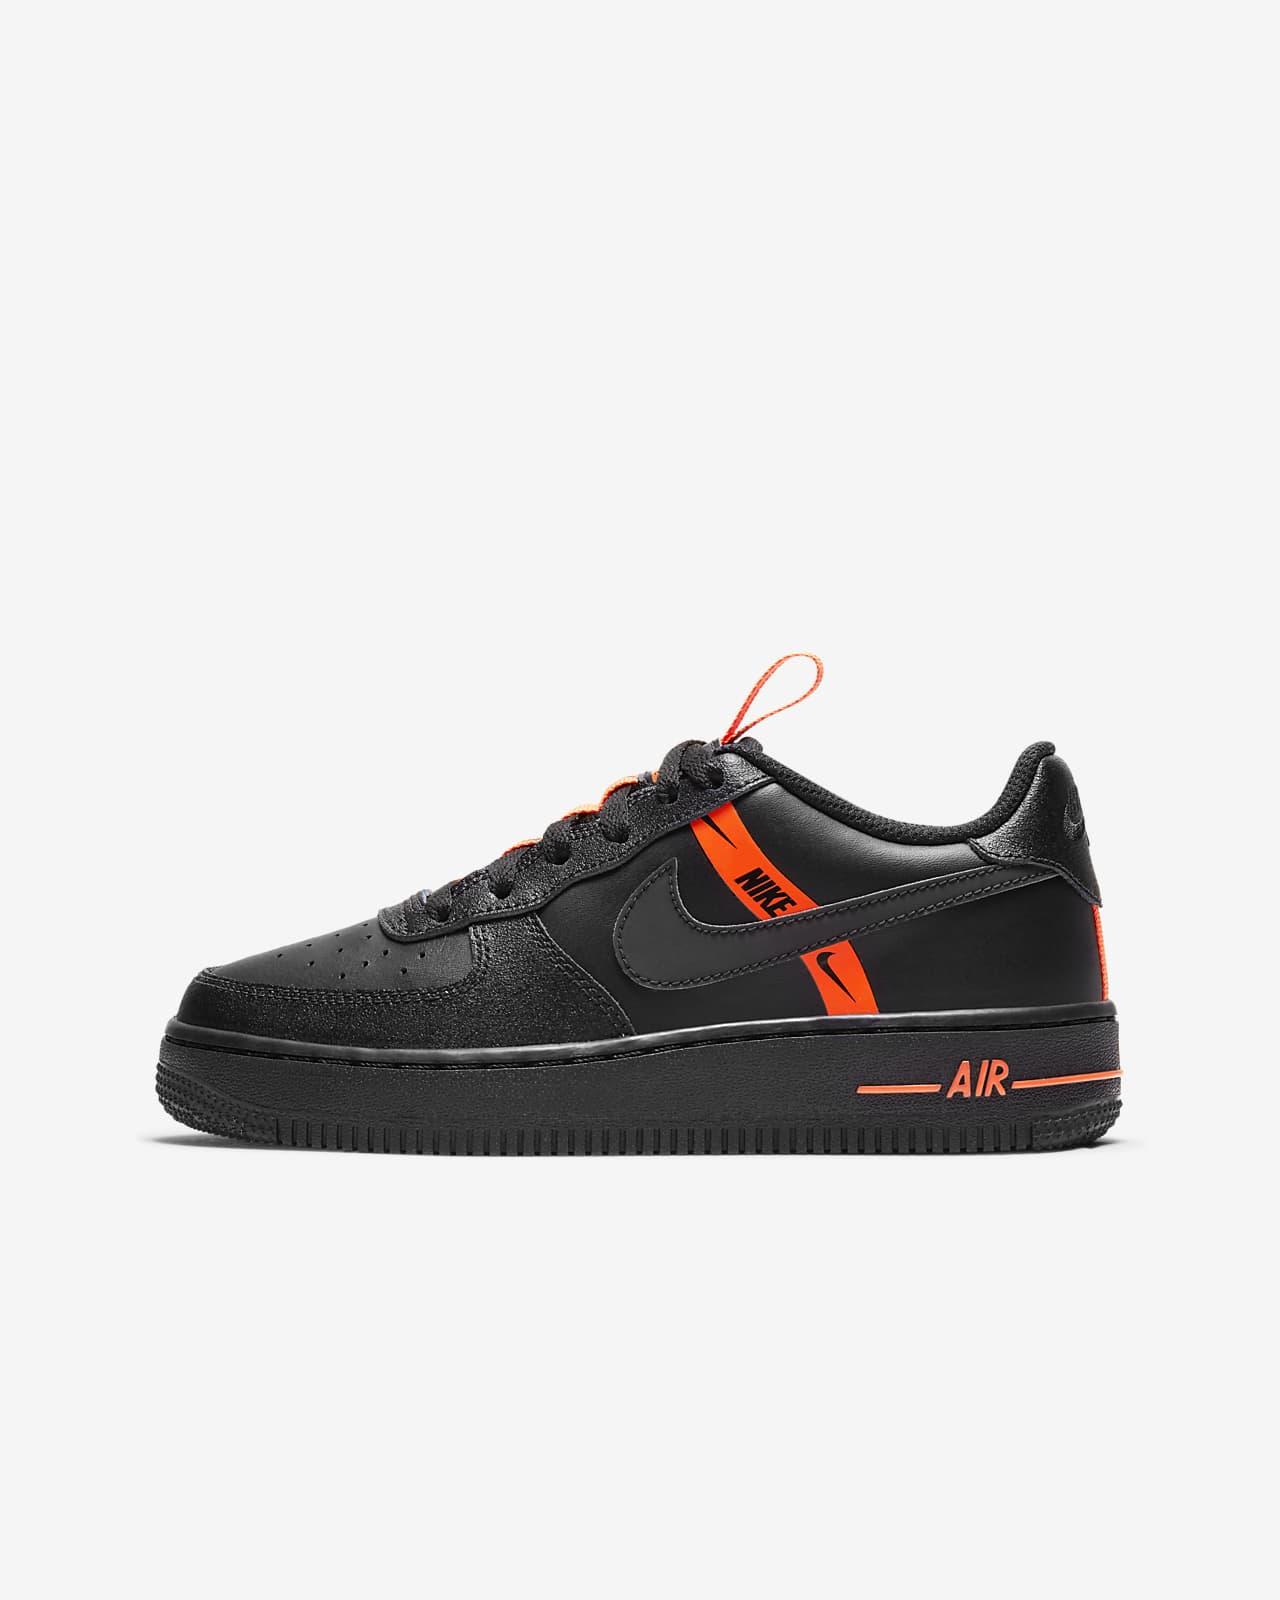 Nike Air Force 1 LV8 KSA (GS) 大童运动童鞋